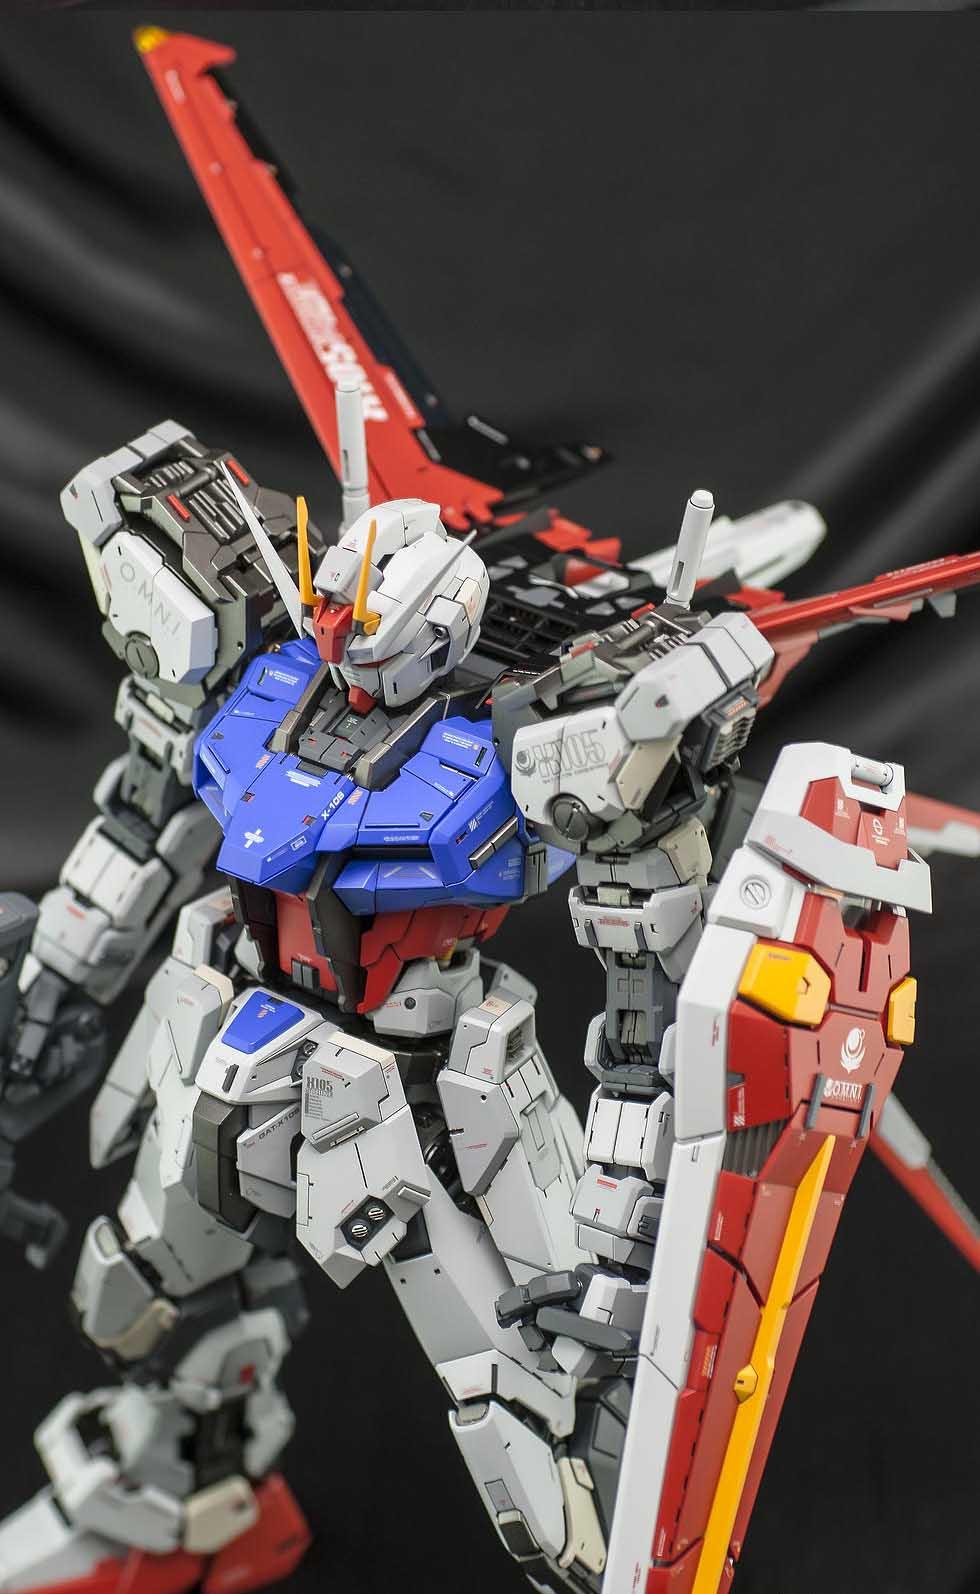 PG 1/60 Aile Strike Gundam - Customized Build